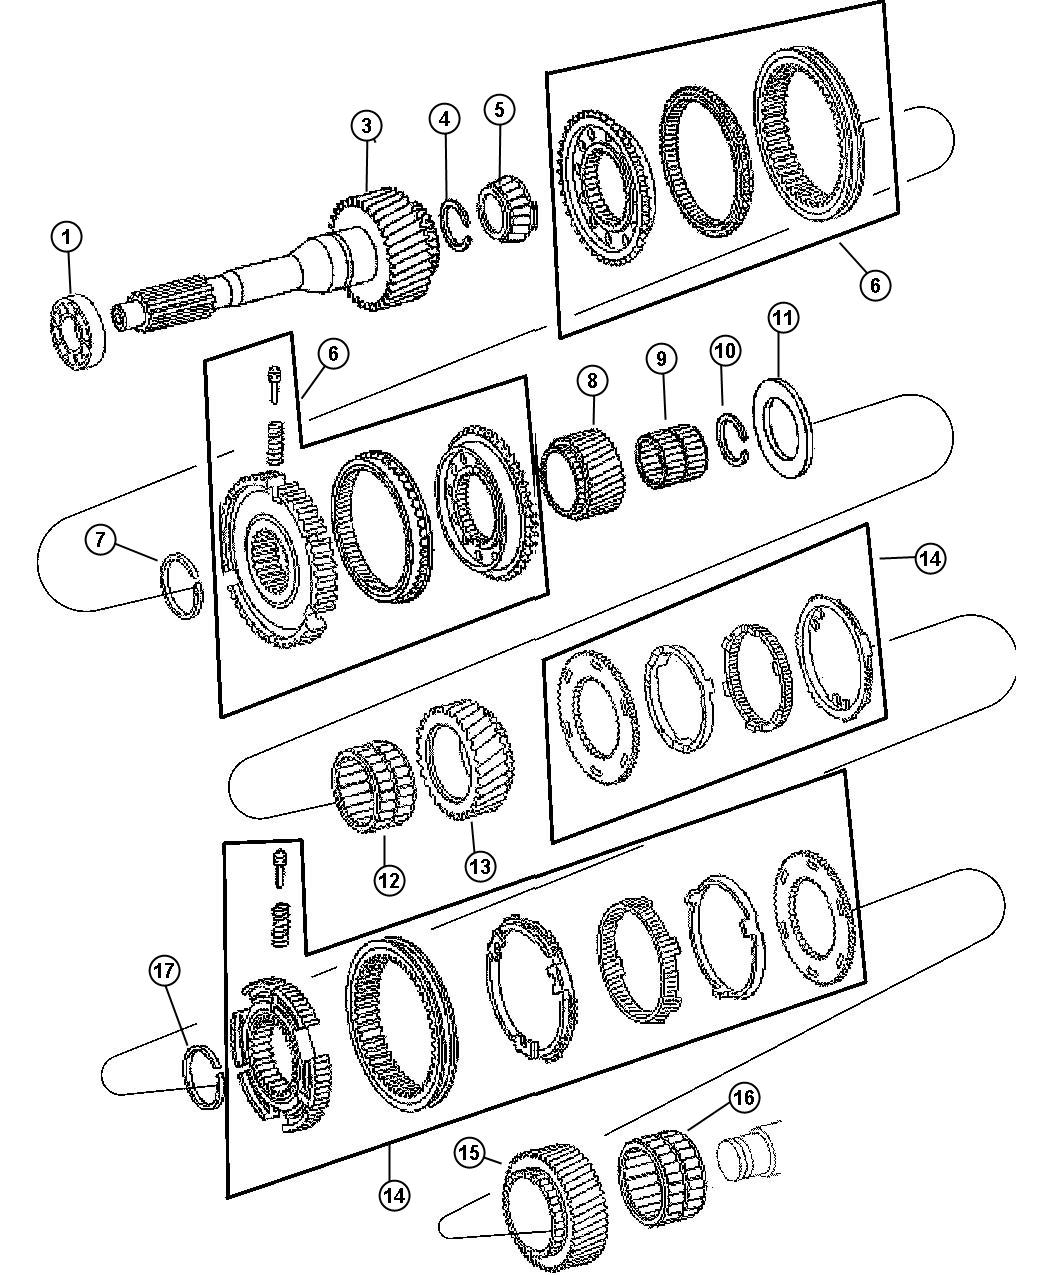 Dodge Ram Snap Ring Body 94 Input Shaft Gears